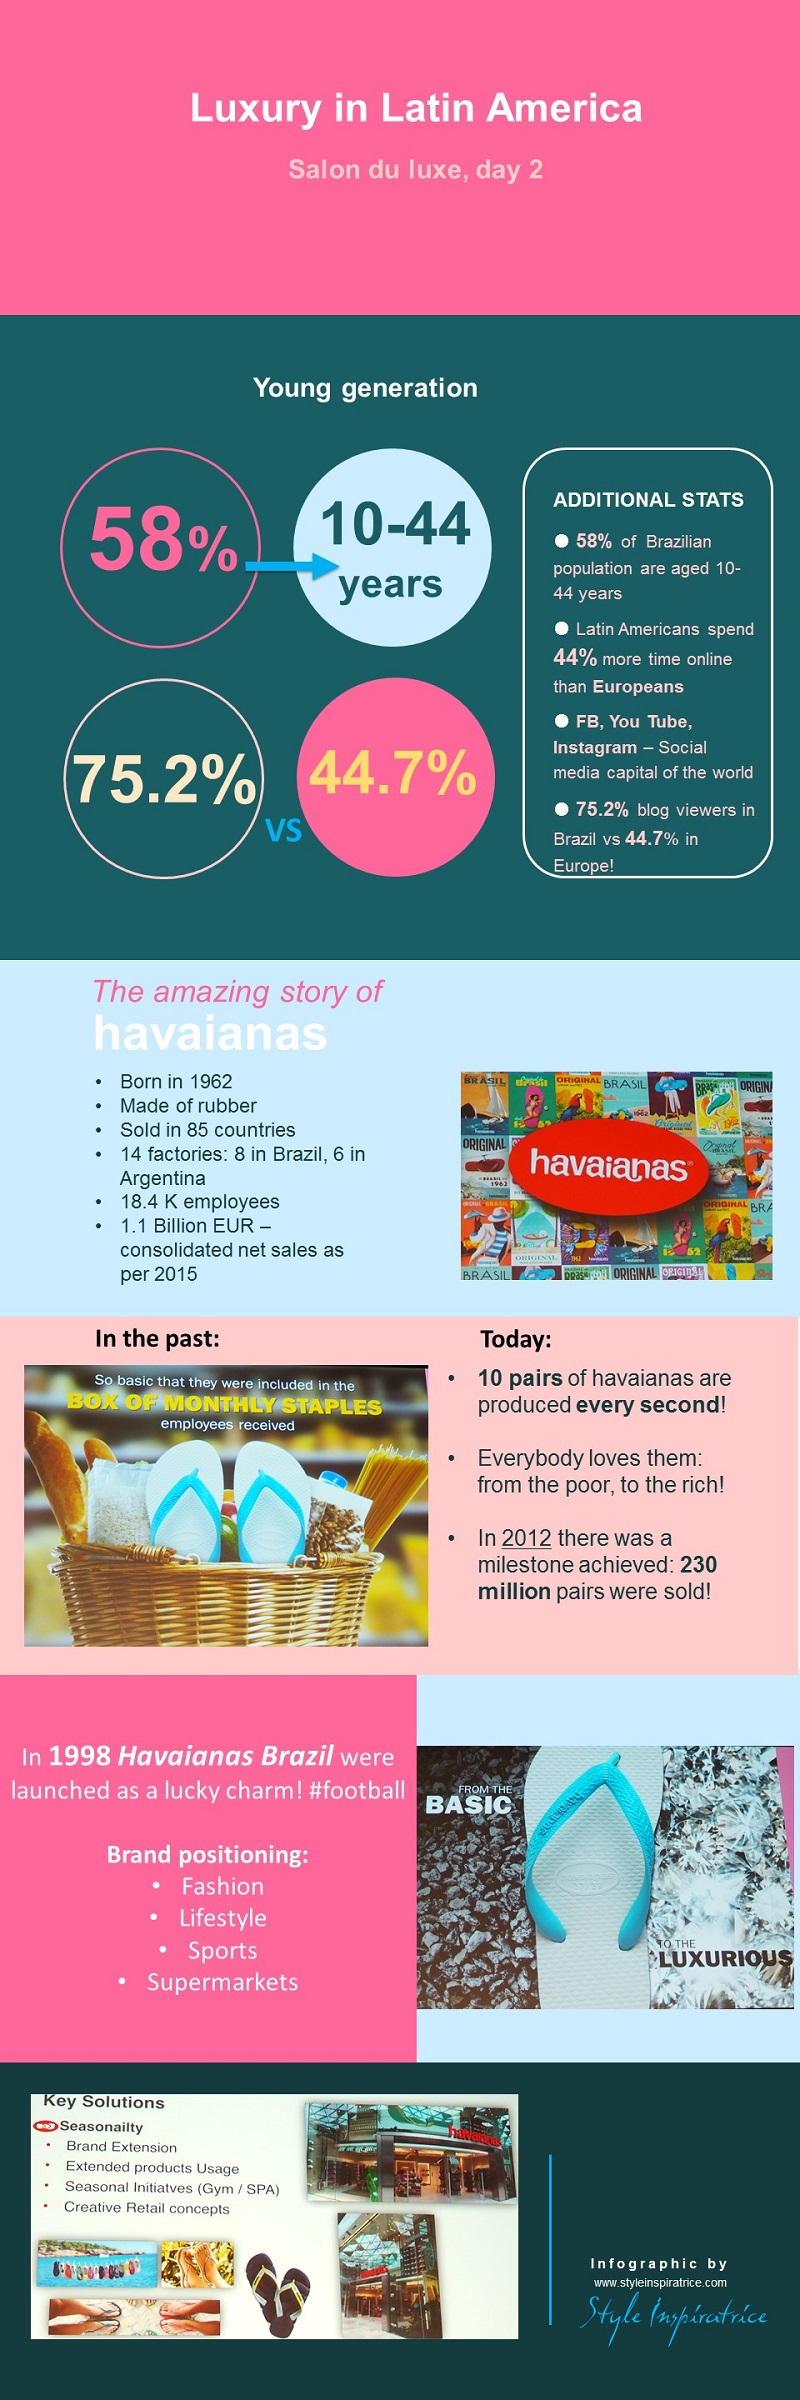 Styleinspiratrice_Infographic_Brazil